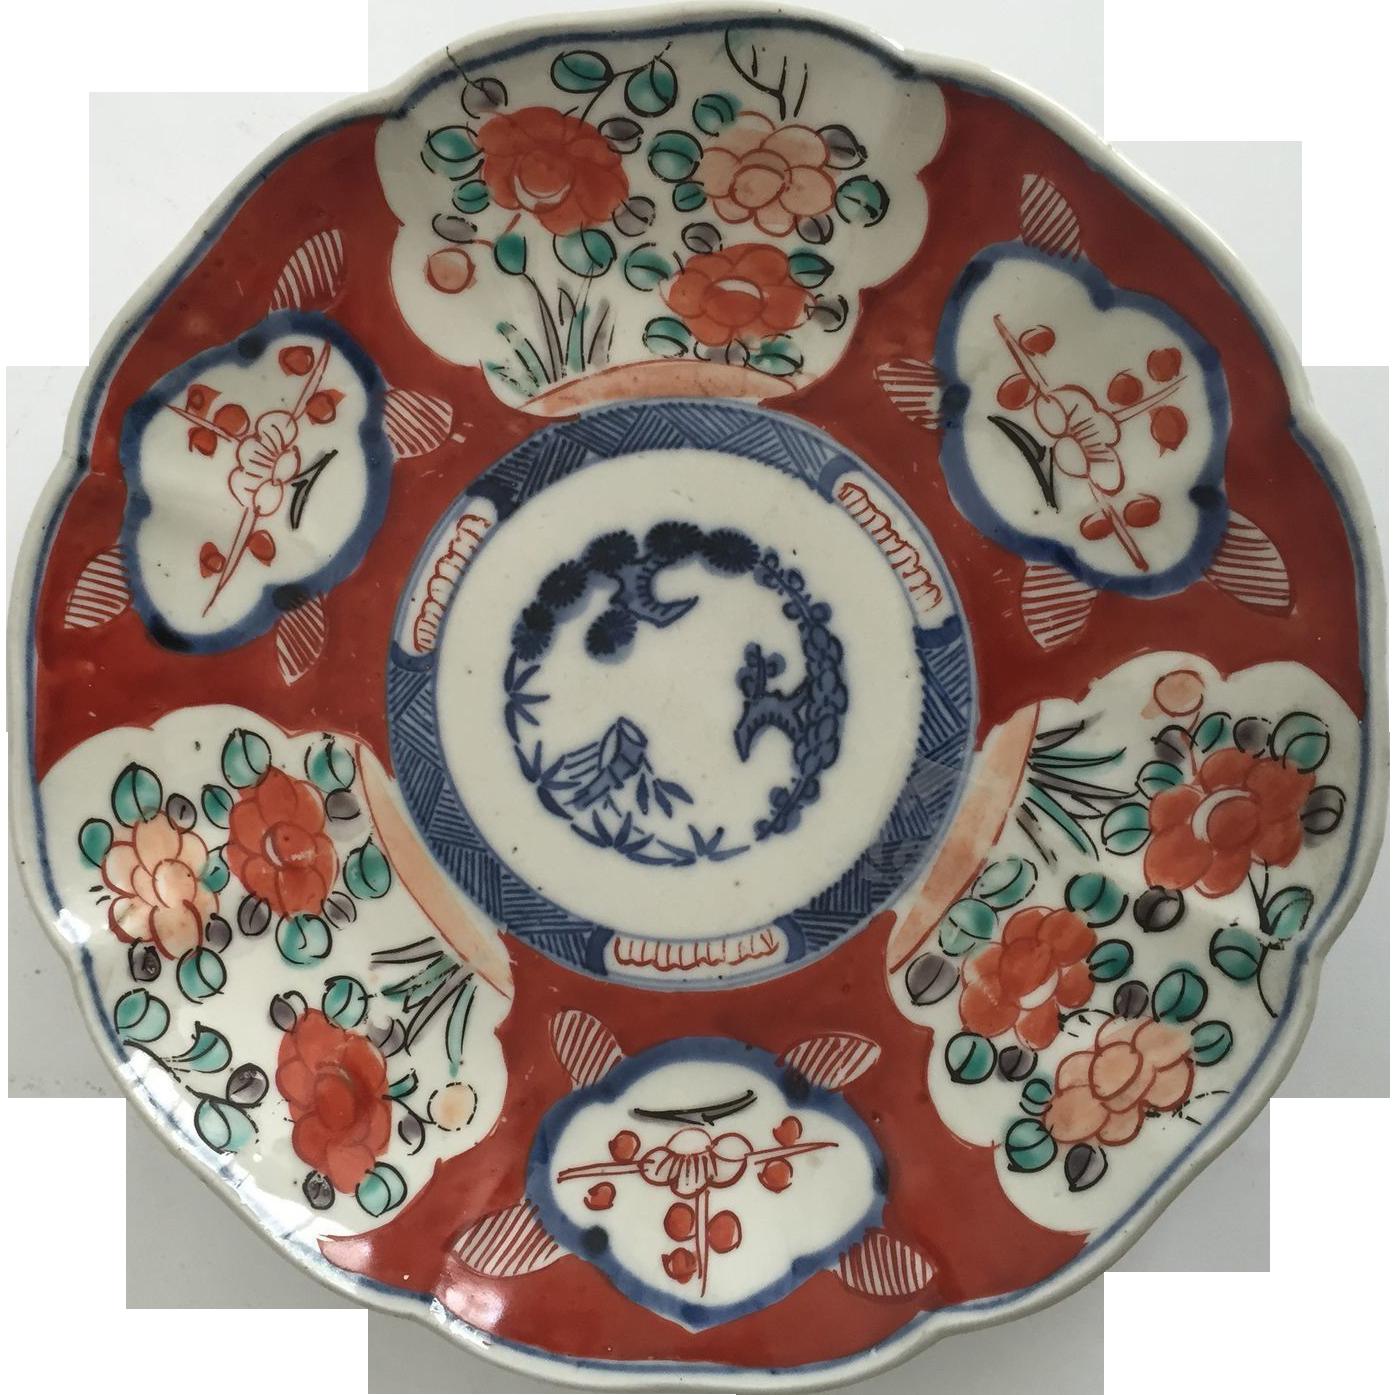 Imari Porcelain Dish, Bird's and Flower's Design